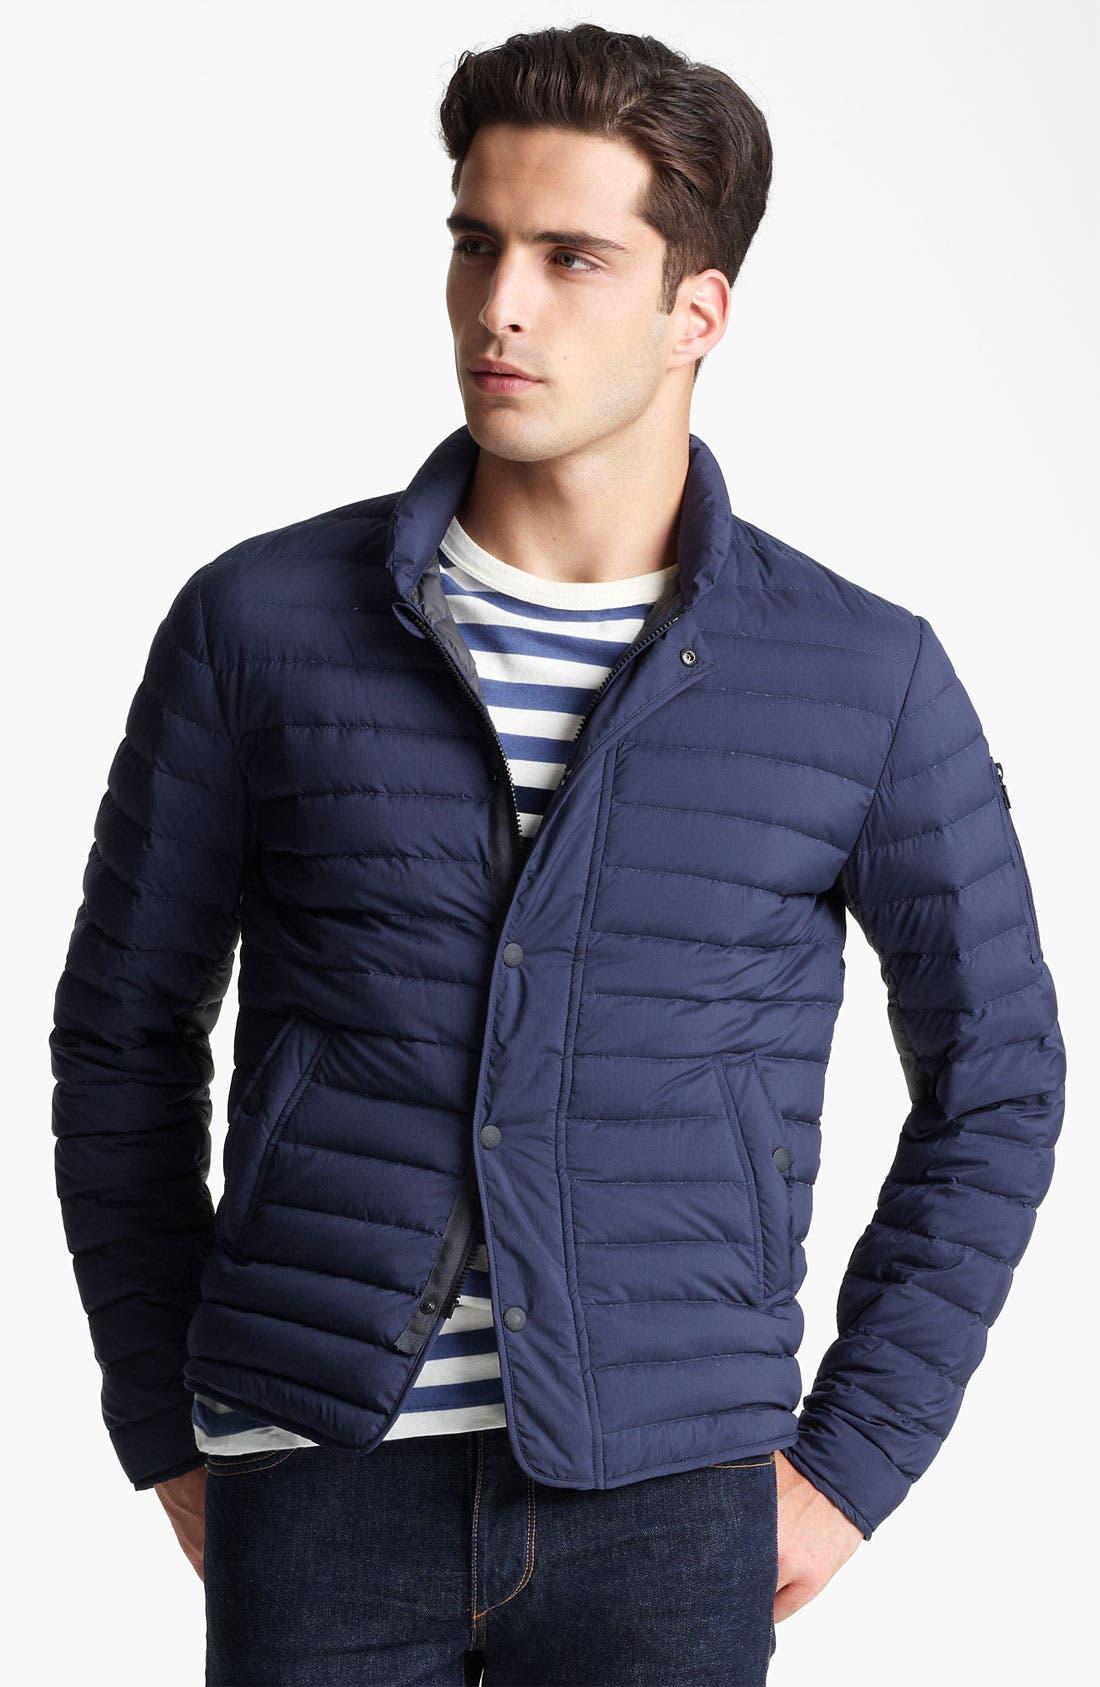 Main Image - rag & bone 'Chelsea' Quilted Jacket